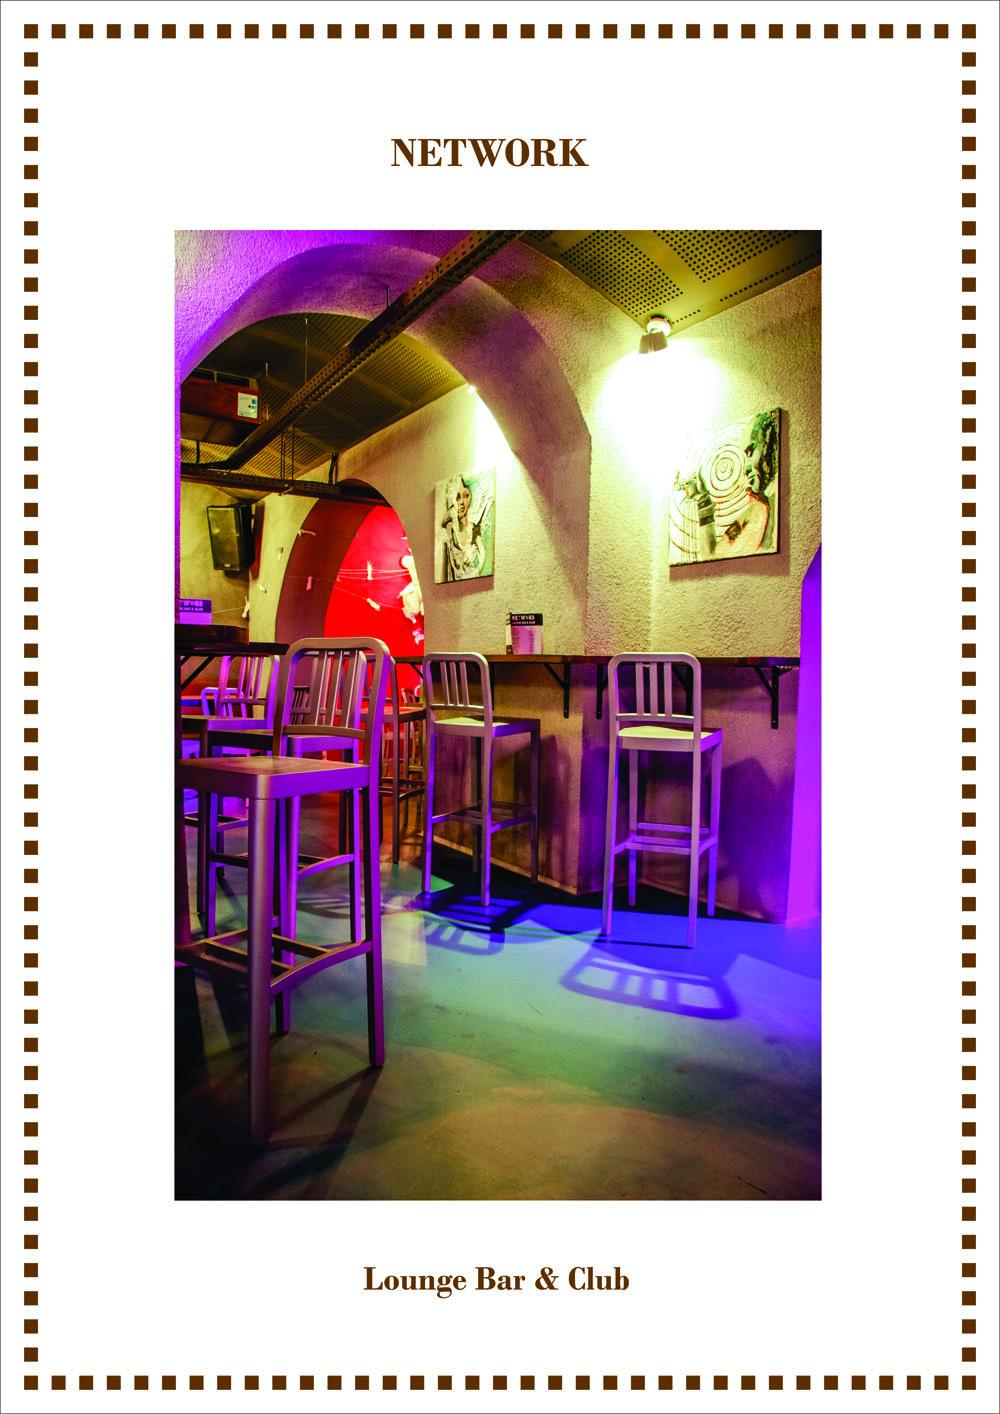 Network Lounge Bar&Club, Bucuresti  - Poza 1